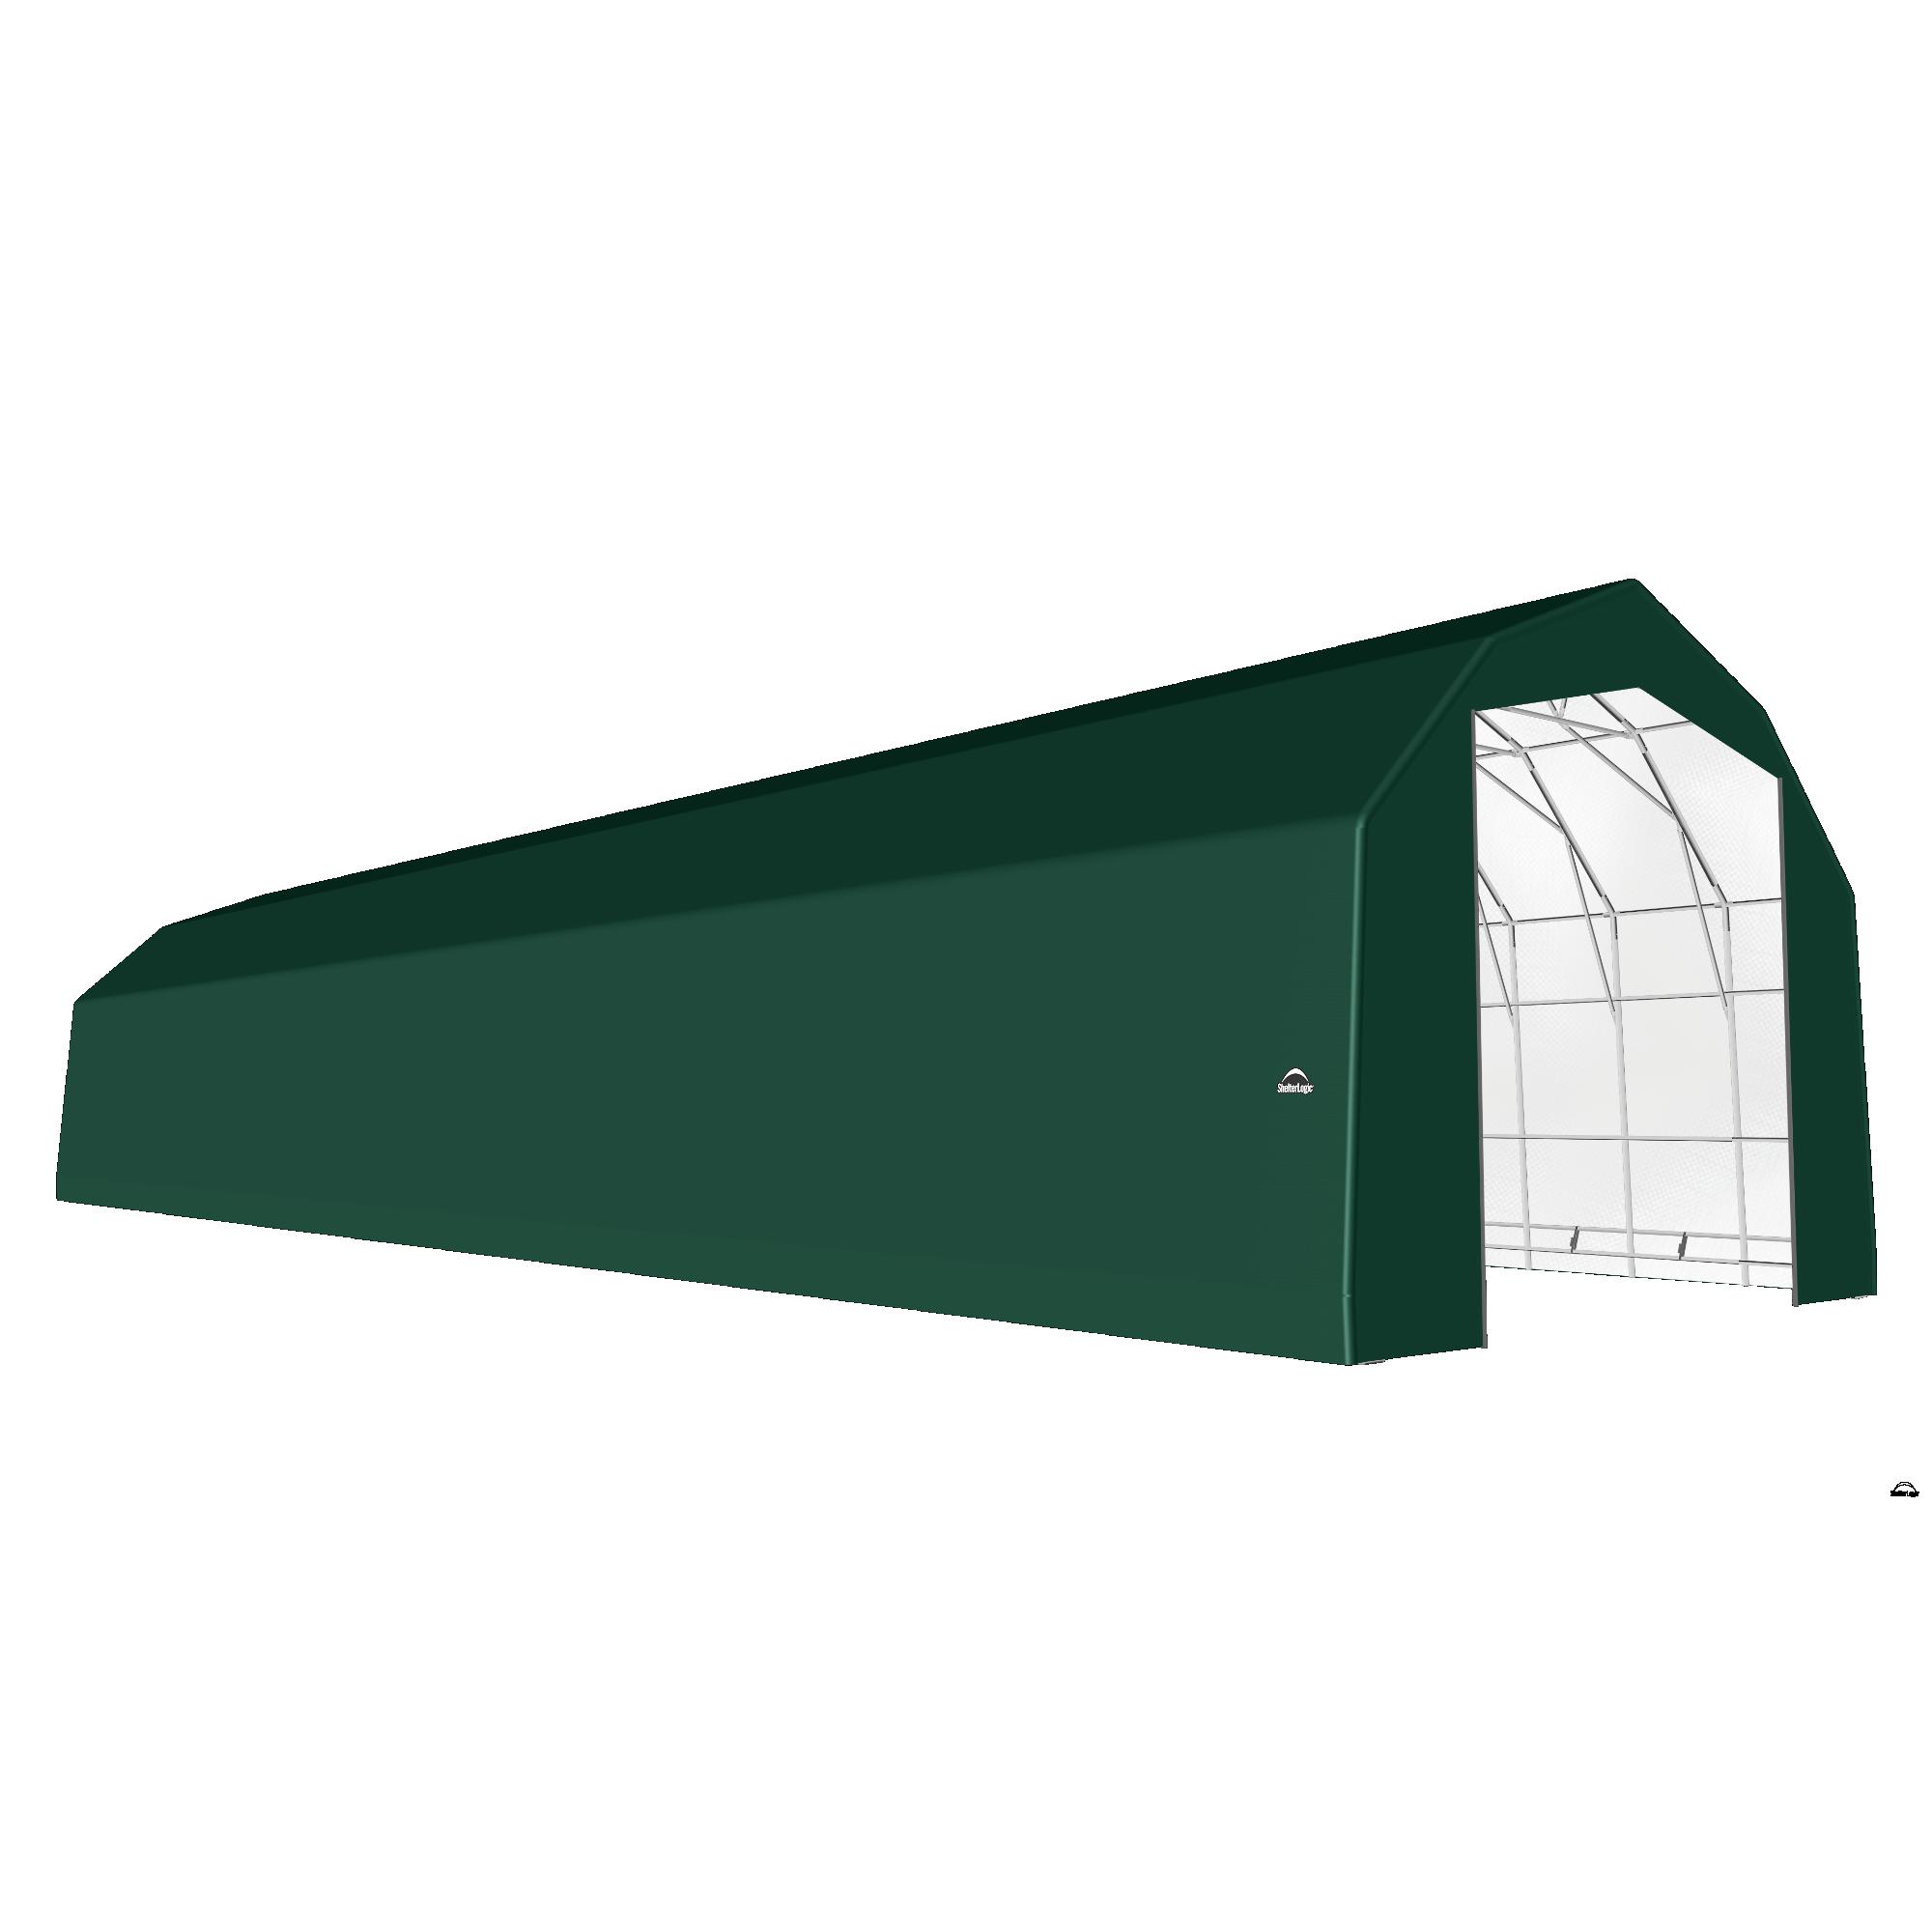 SP Barn 25X96X20 Green 14 oz PE Shelter